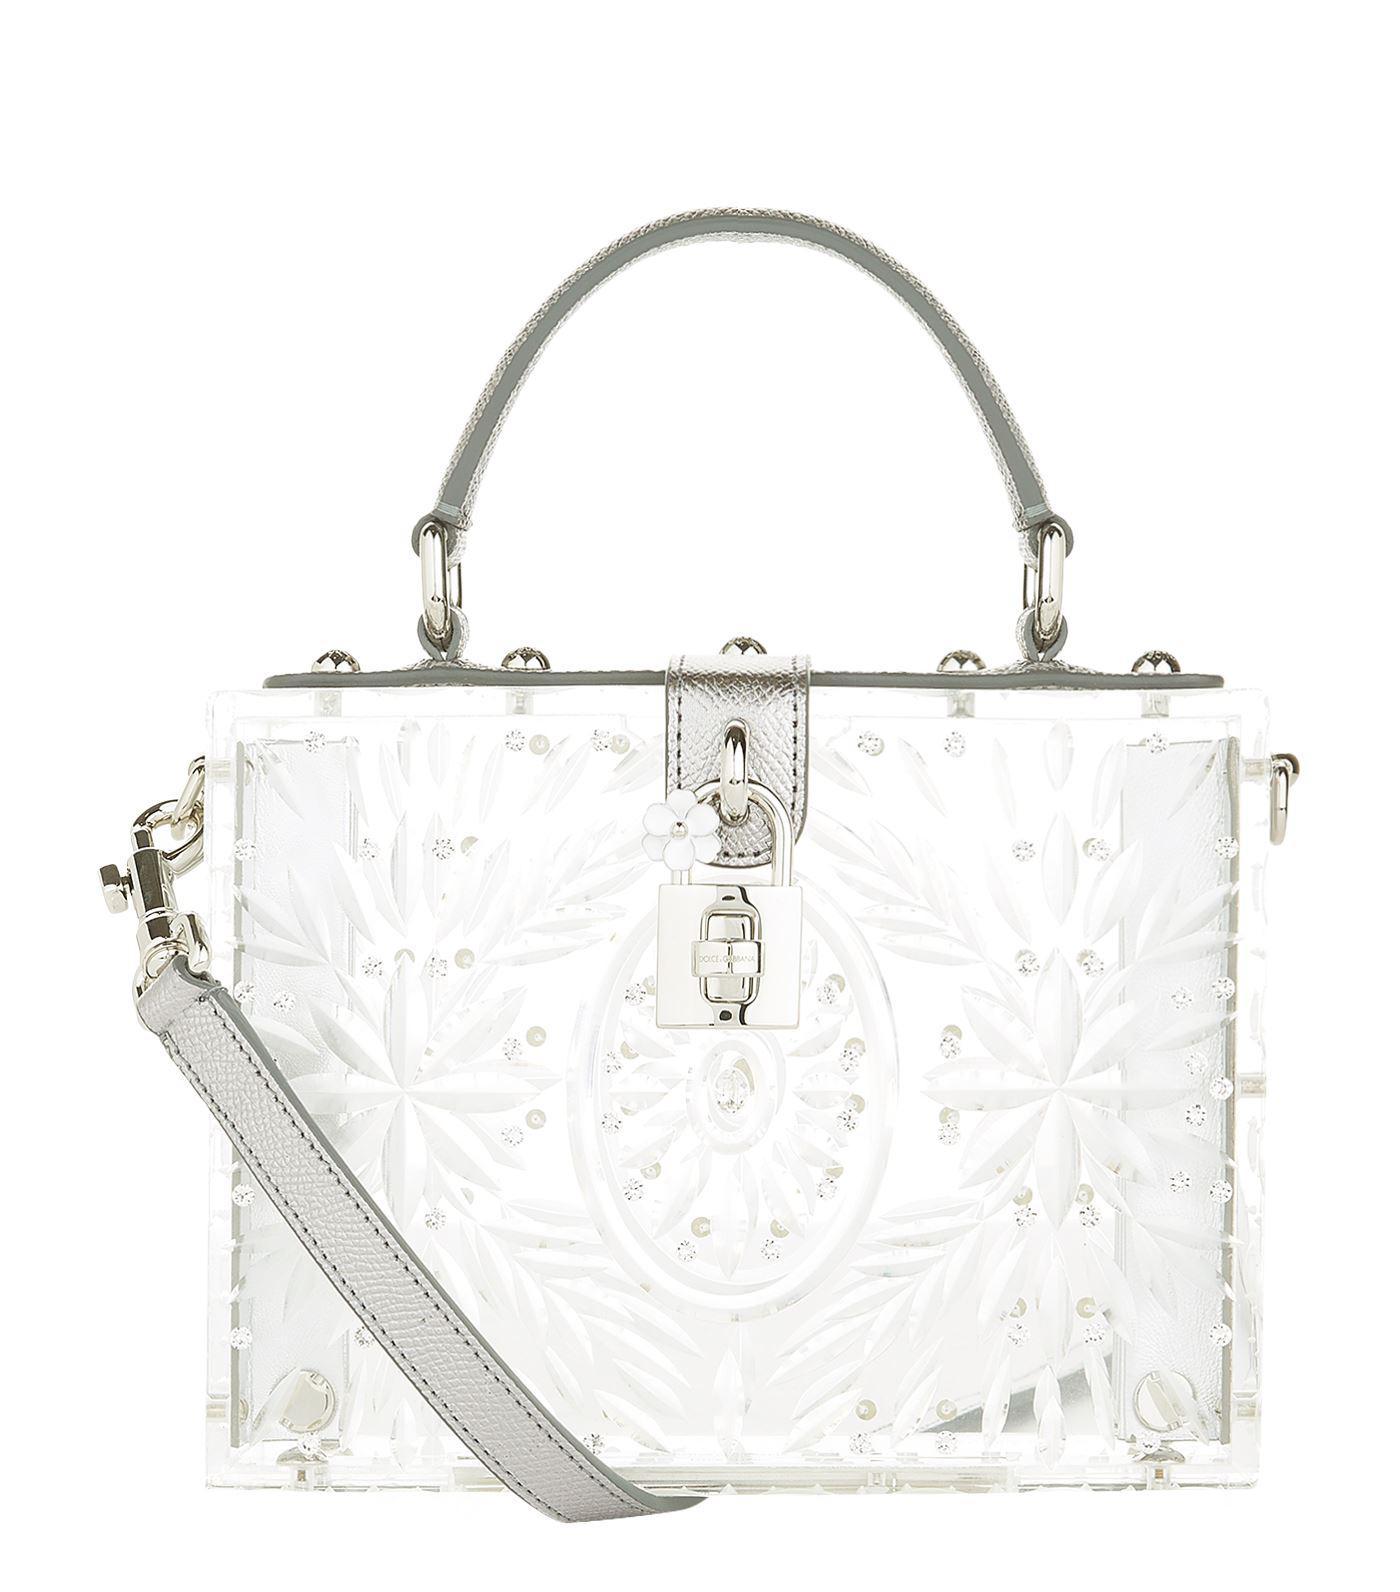 Gabbana Handle Dolce Padlock Plexiglass Bag Lyst amp; Top 6Fq57U